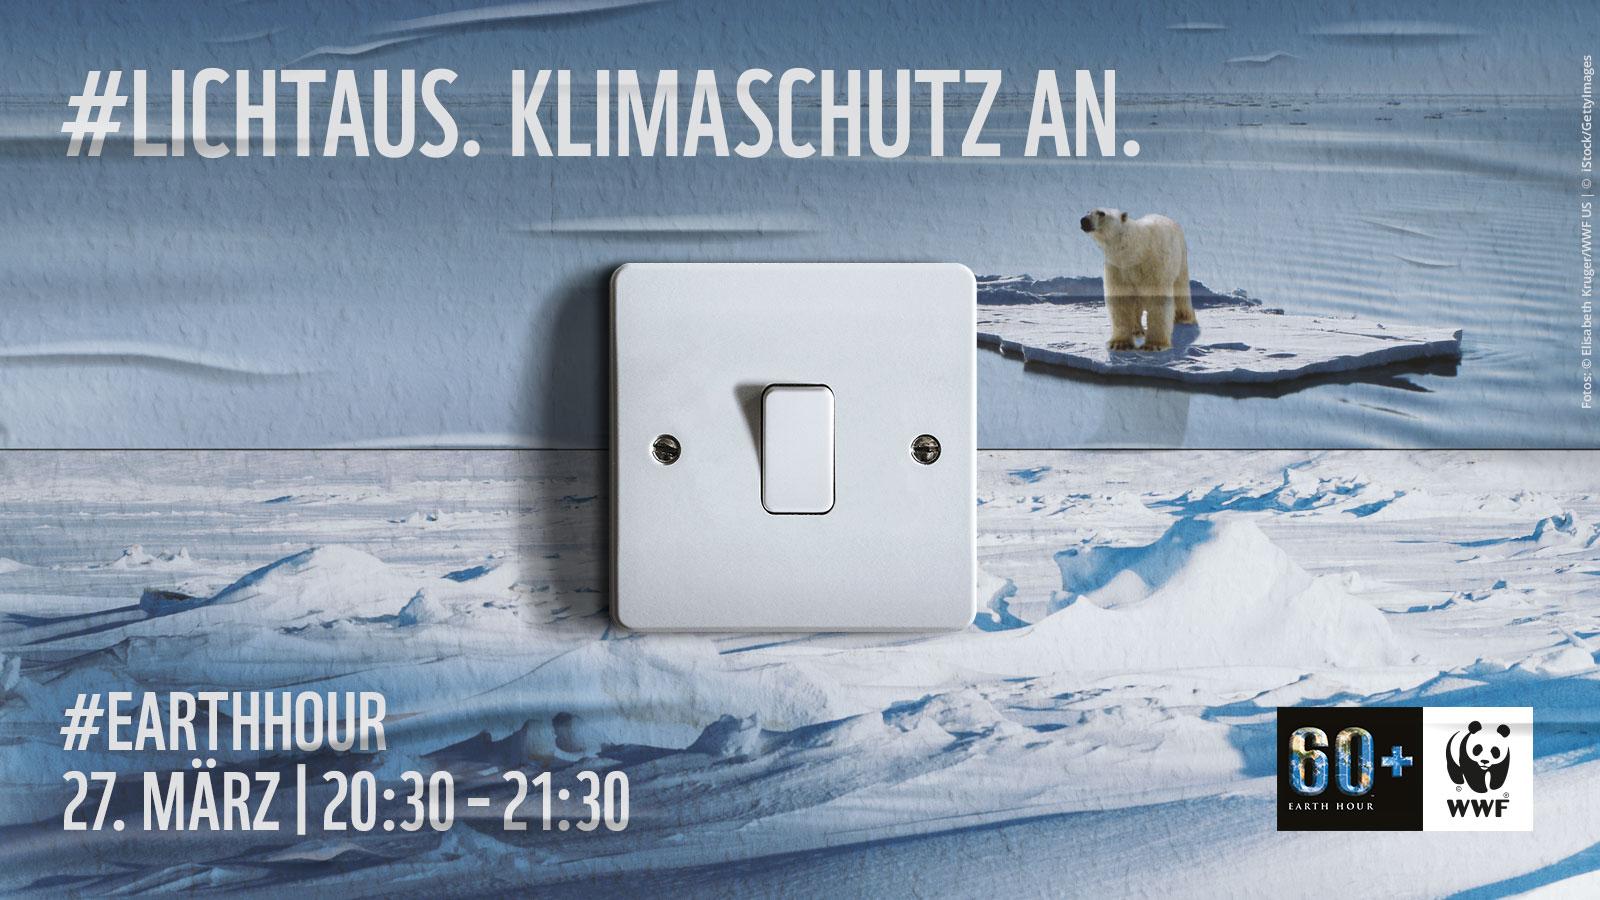 Plakat des WWF zur Earth Hour 2021 (Foto: WWF)